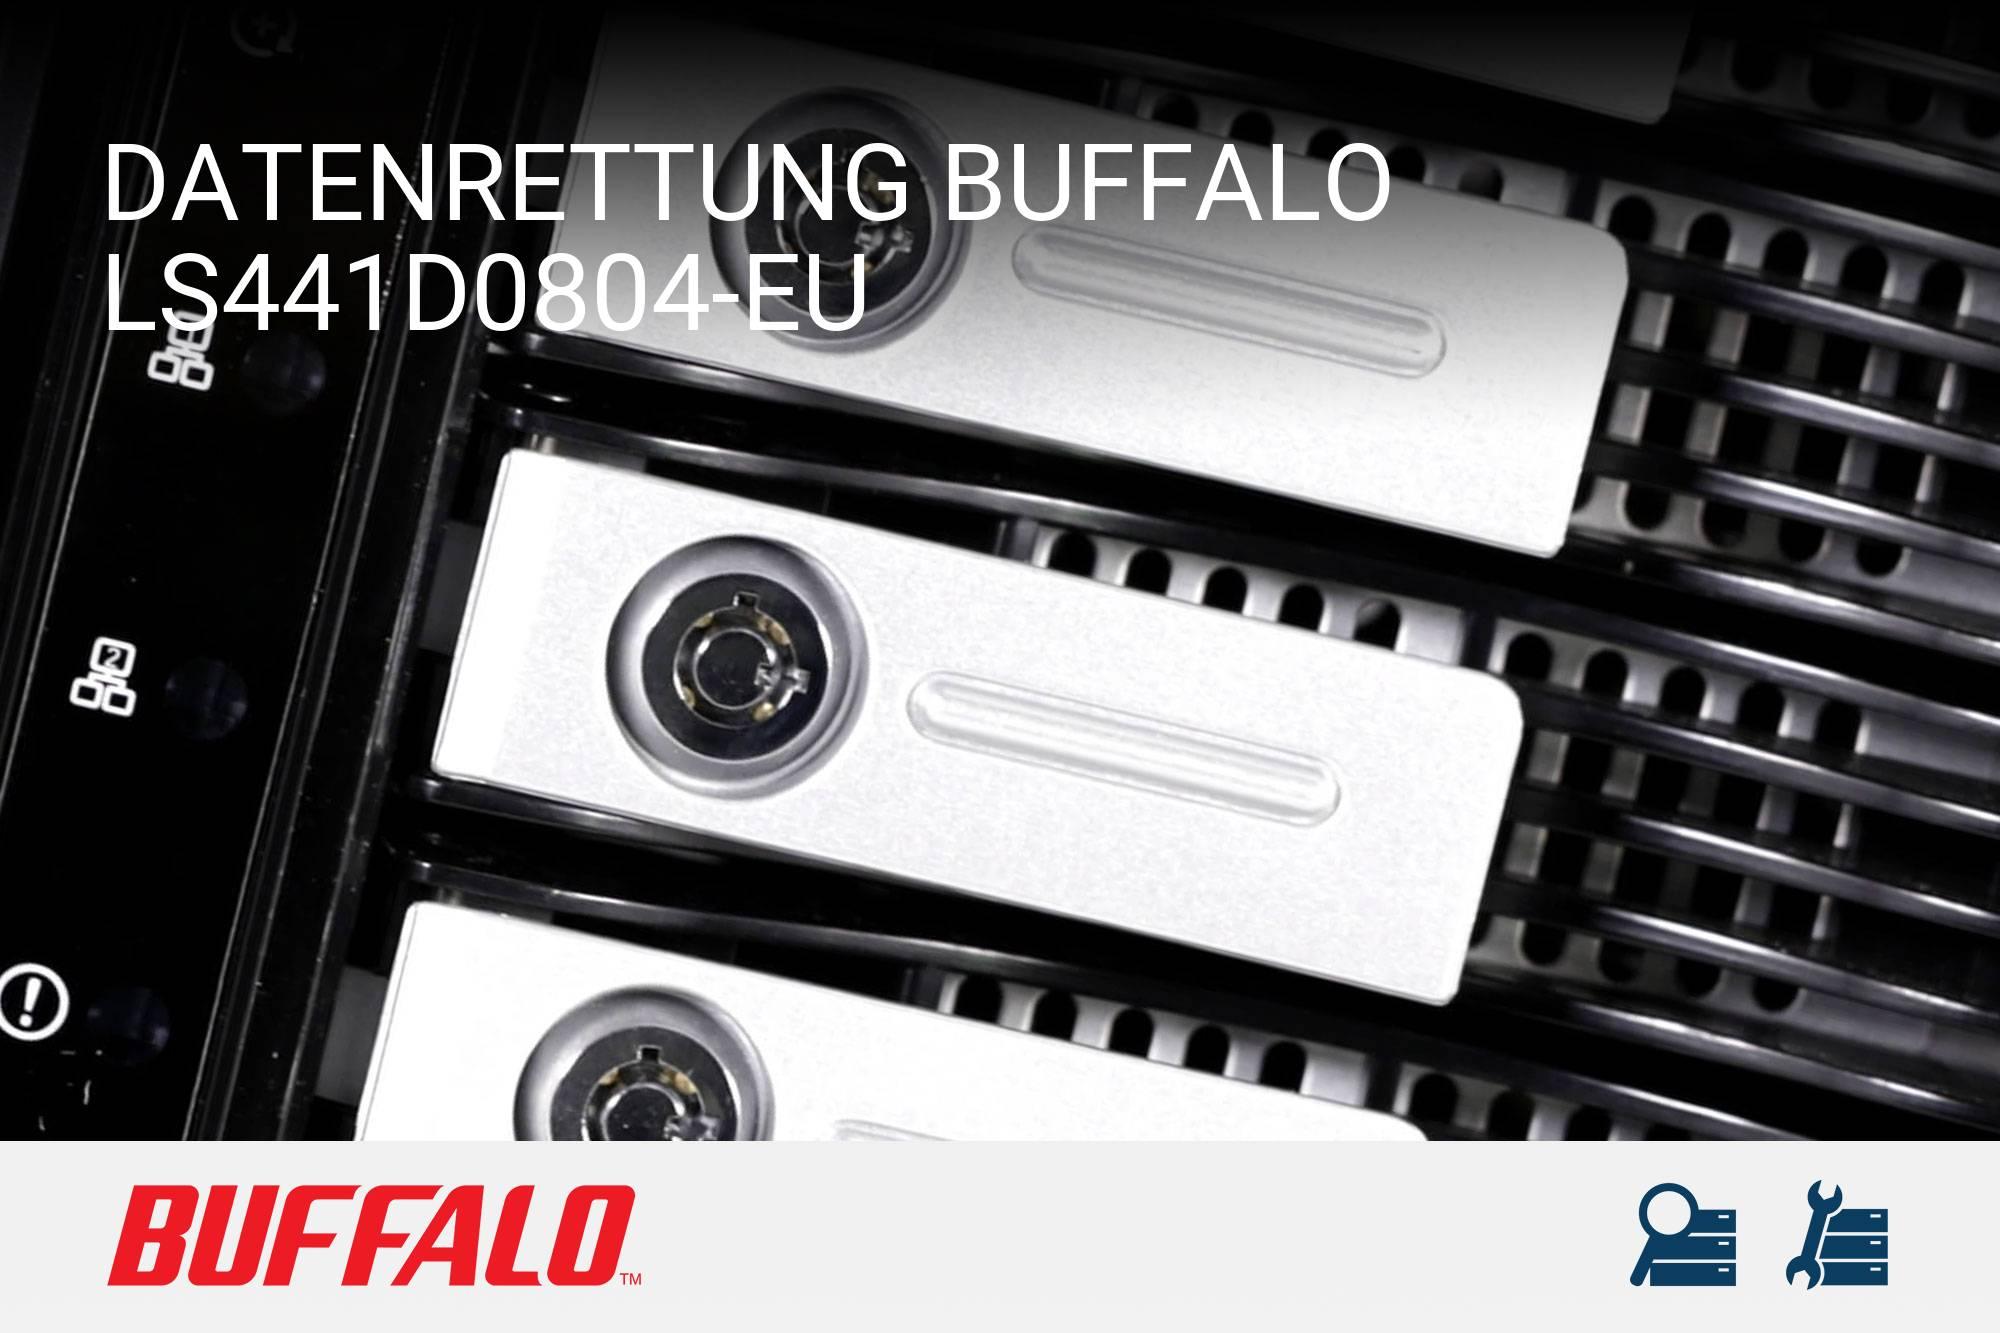 Buffalo LS441D0804-EU